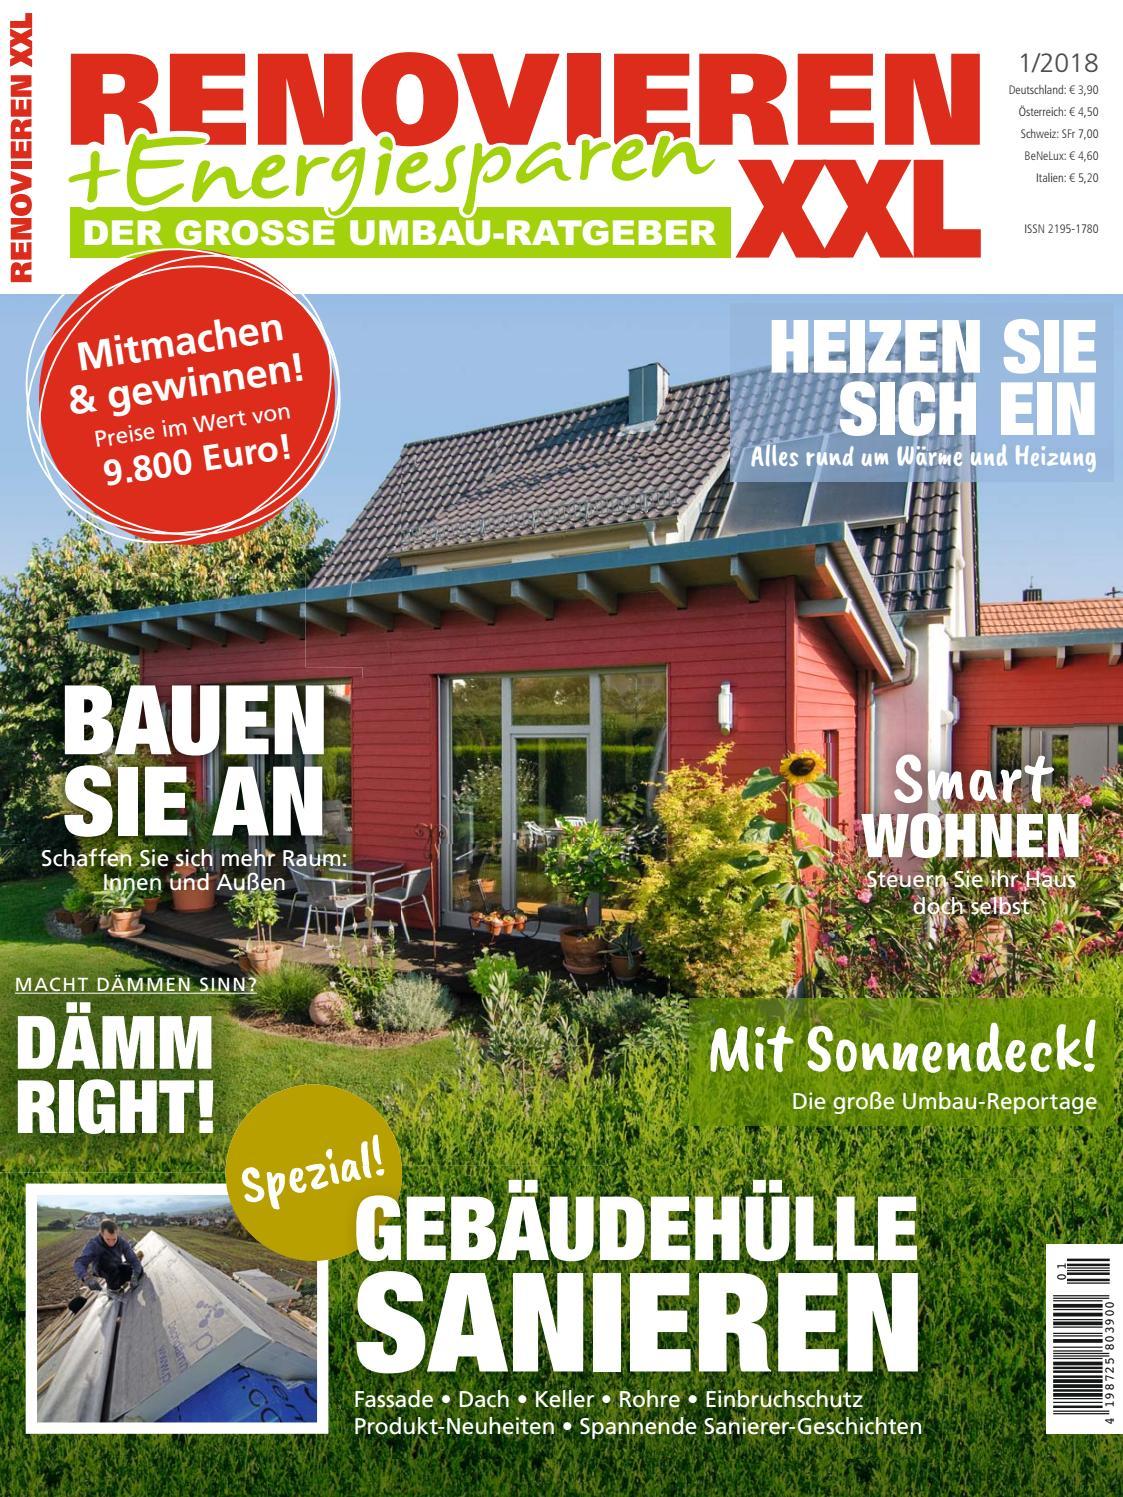 Garten Anlegen Neubau Elegant Renovieren & Energiesparen 1 2018 by Family Home Verlag Gmbh